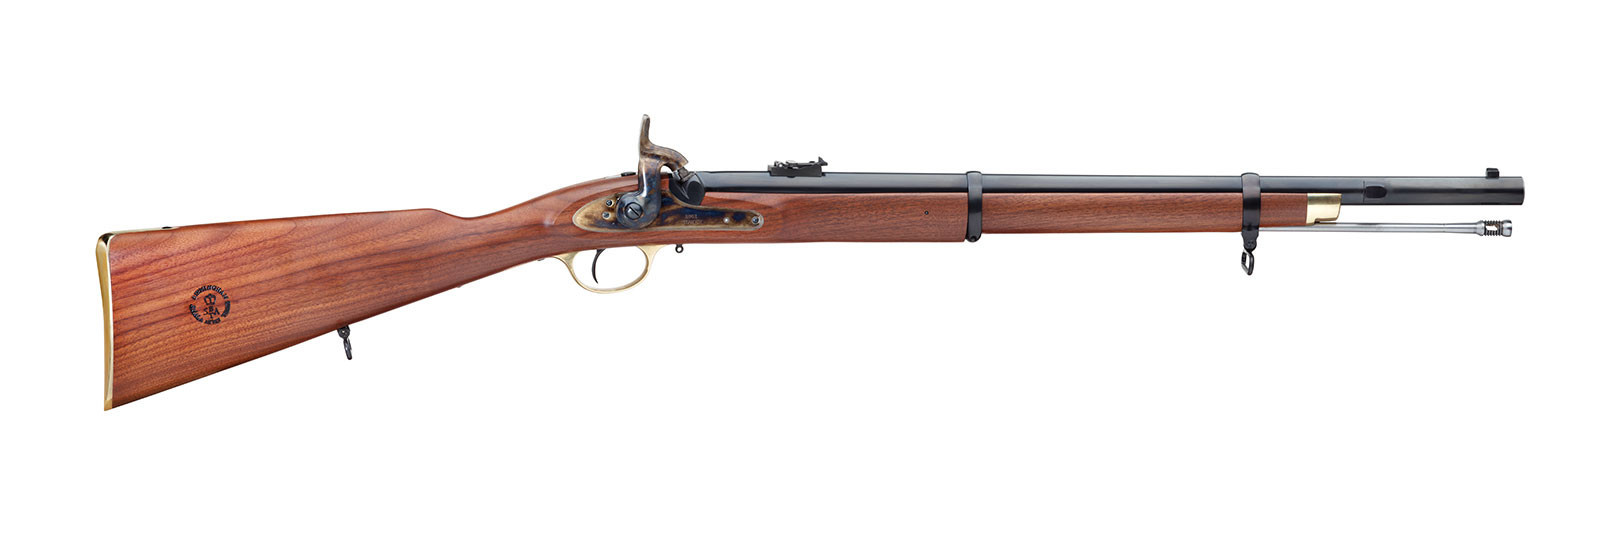 Enfield Musketoon Pattern 1861 Short Rifle